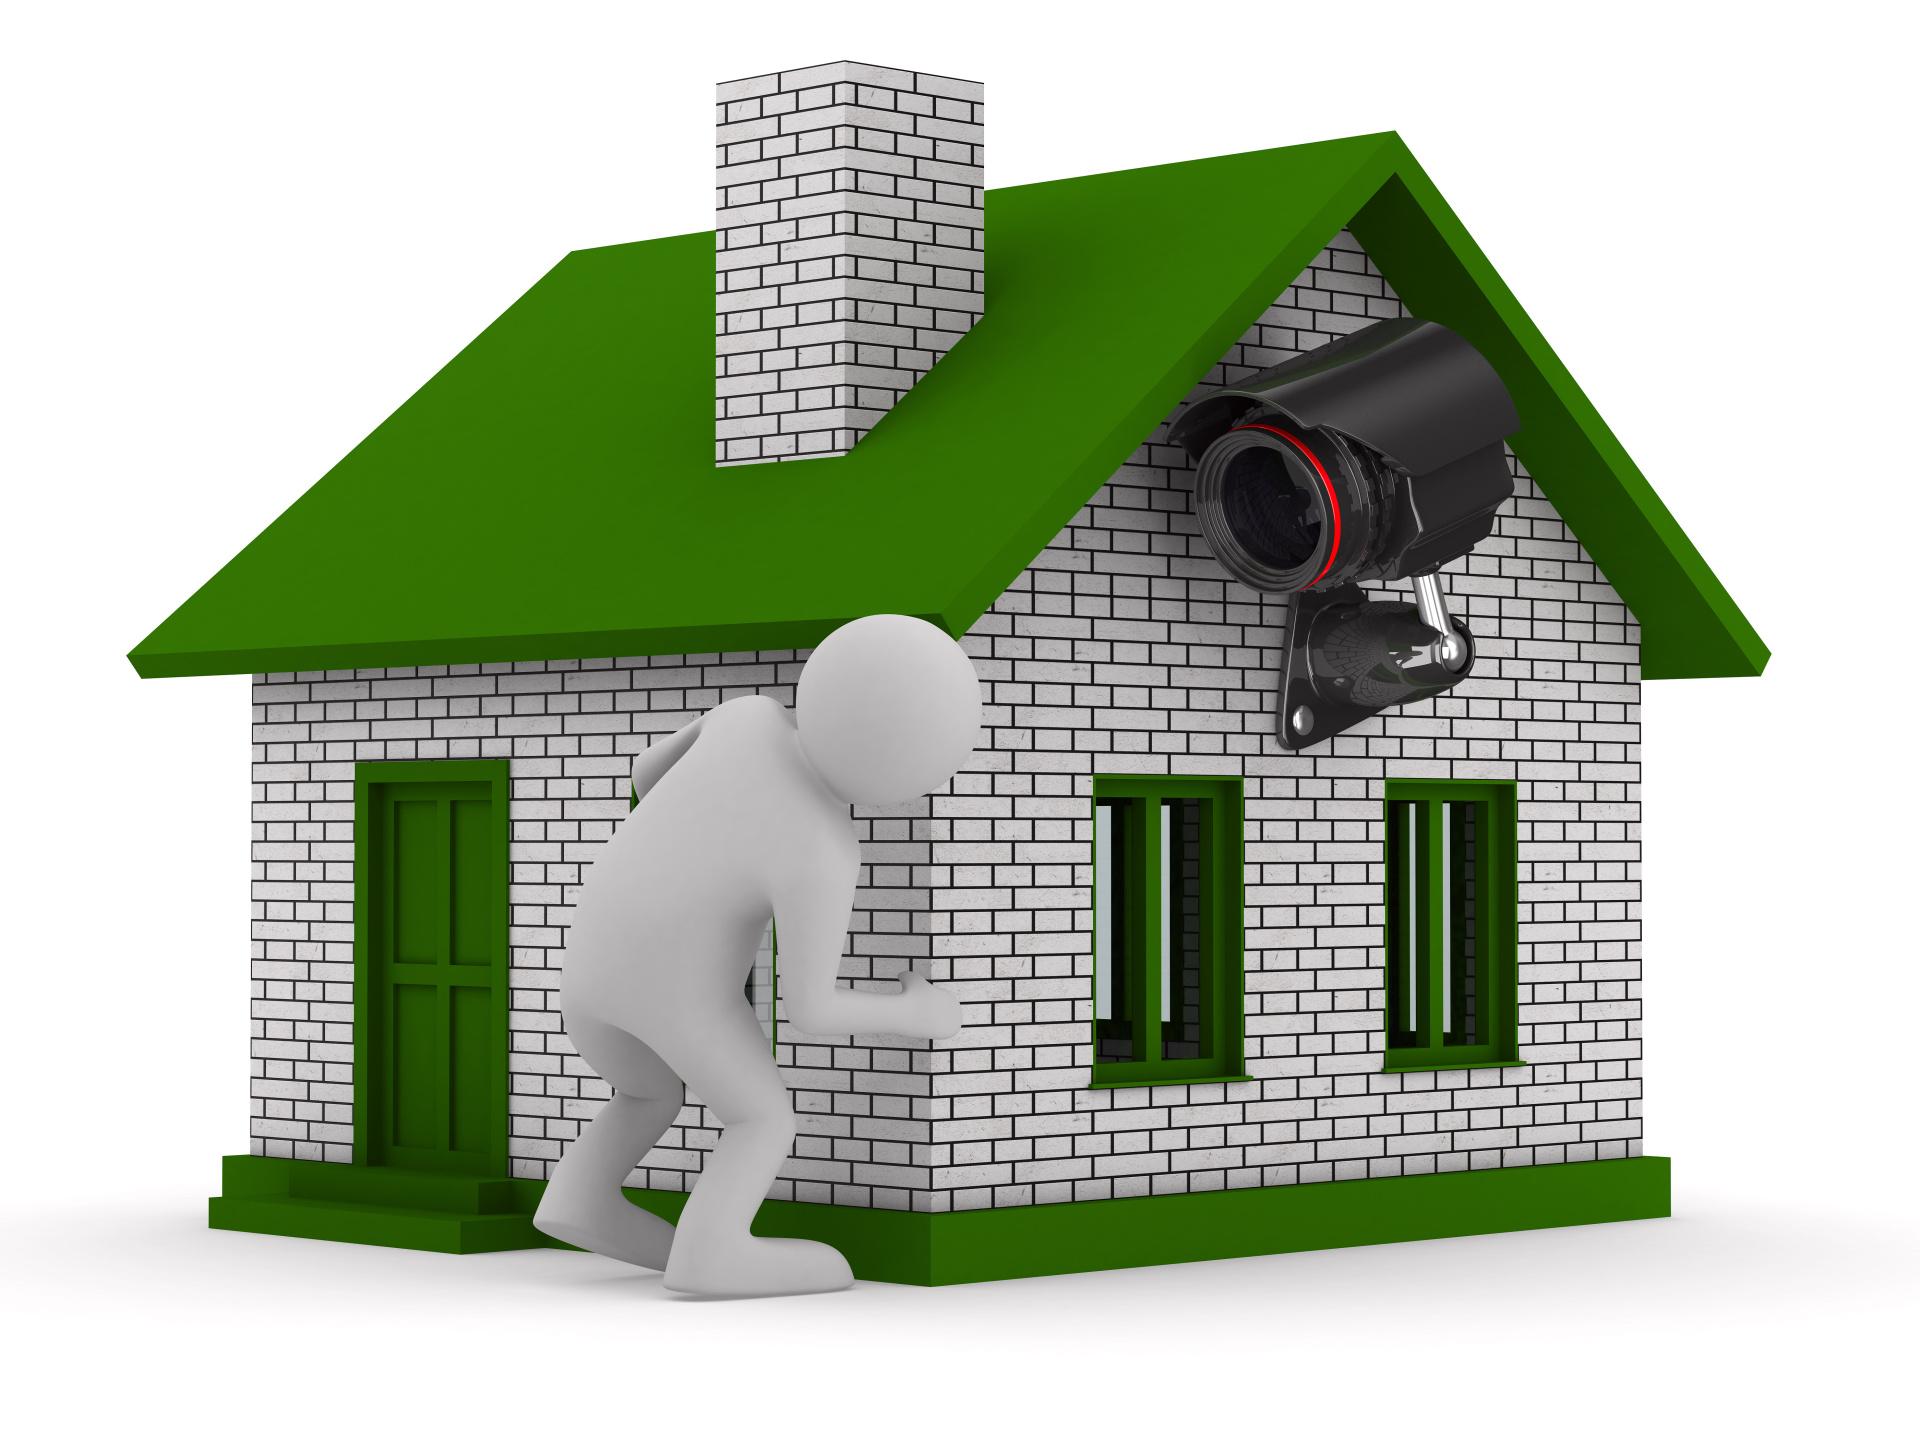 security camera system, surveillance cameras, IP Cameras